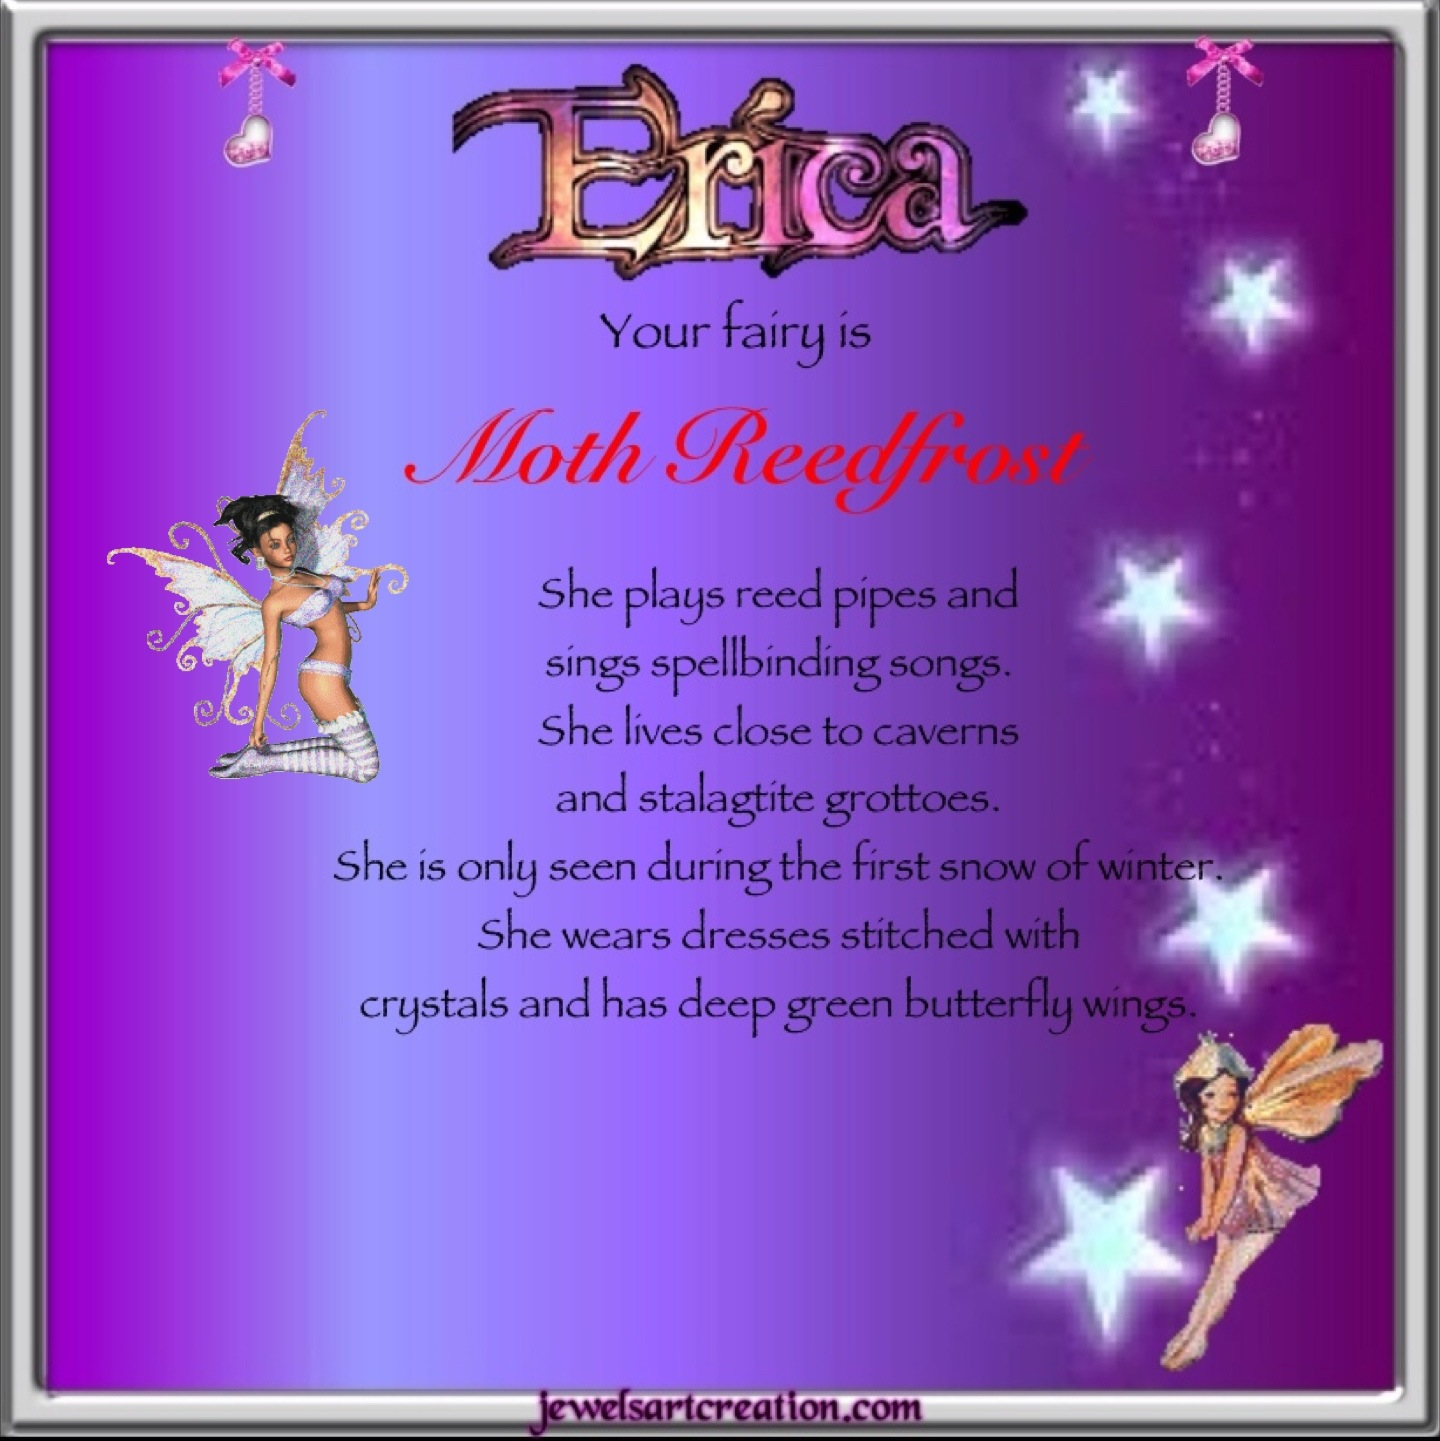 Erica Fairy Name ~ Jewels Art Creation.